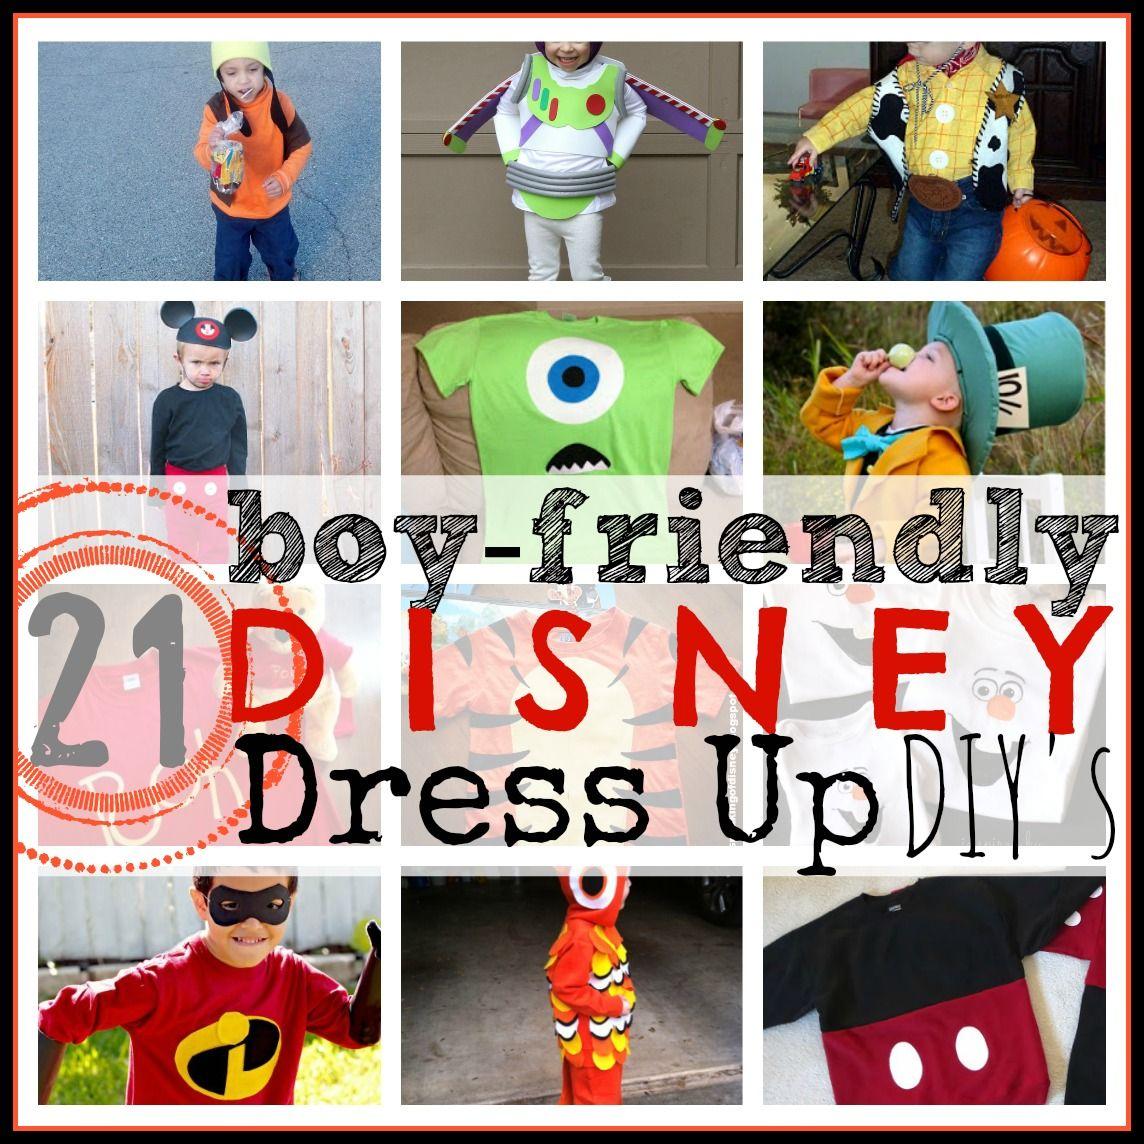 Disney Dress Up Clothes for Boys!